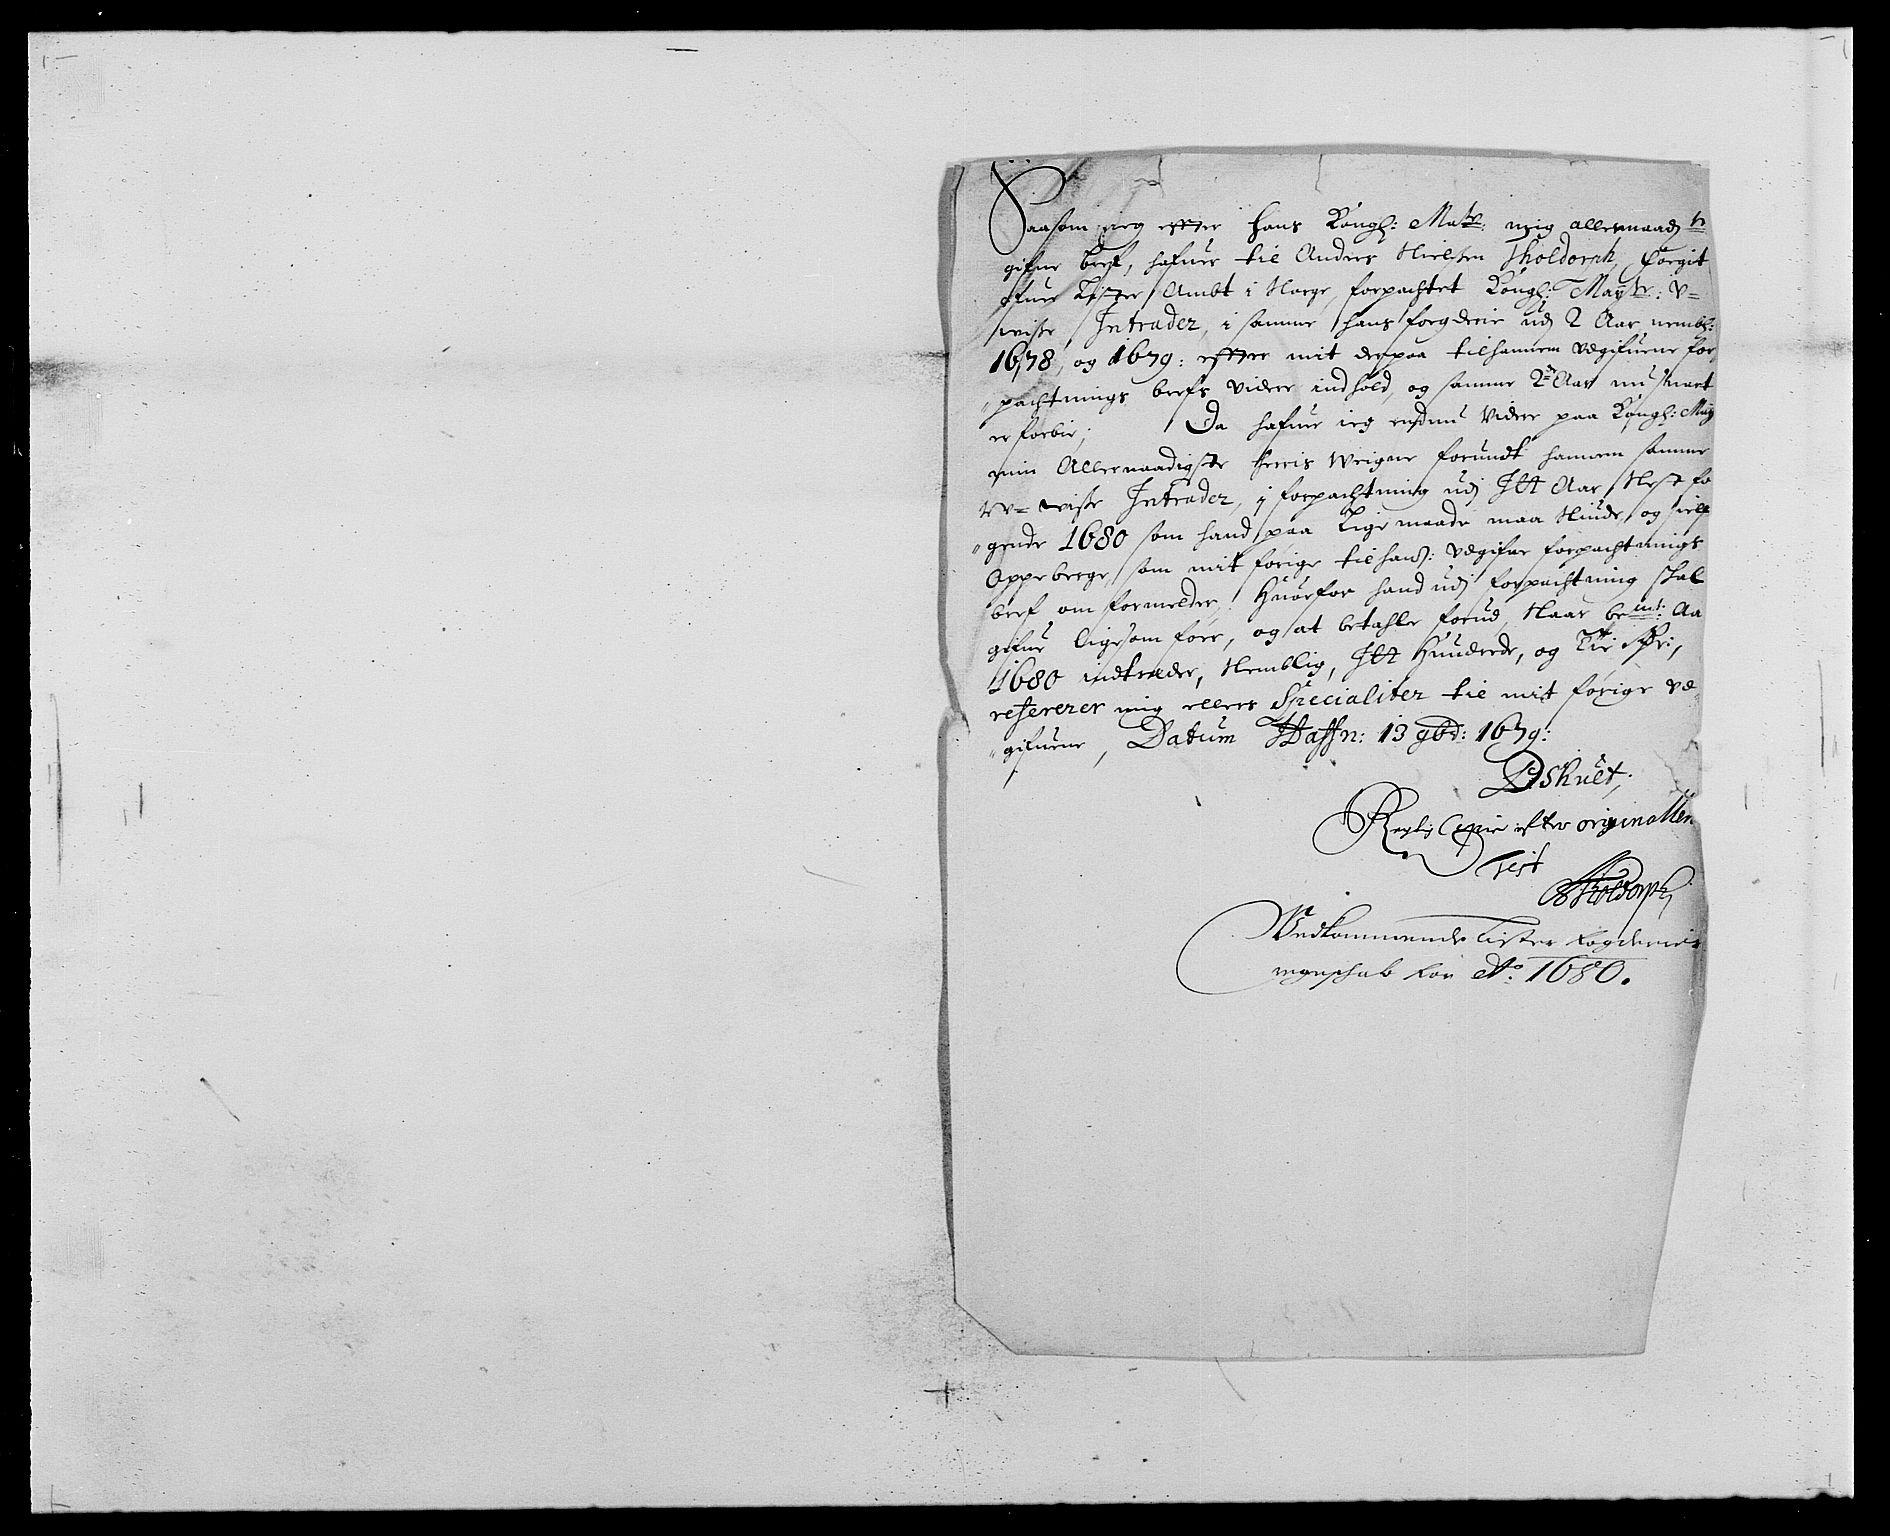 RA, Rentekammeret inntil 1814, Reviderte regnskaper, Fogderegnskap, R41/L2531: Fogderegnskap Lista, 1680-1682, s. 62